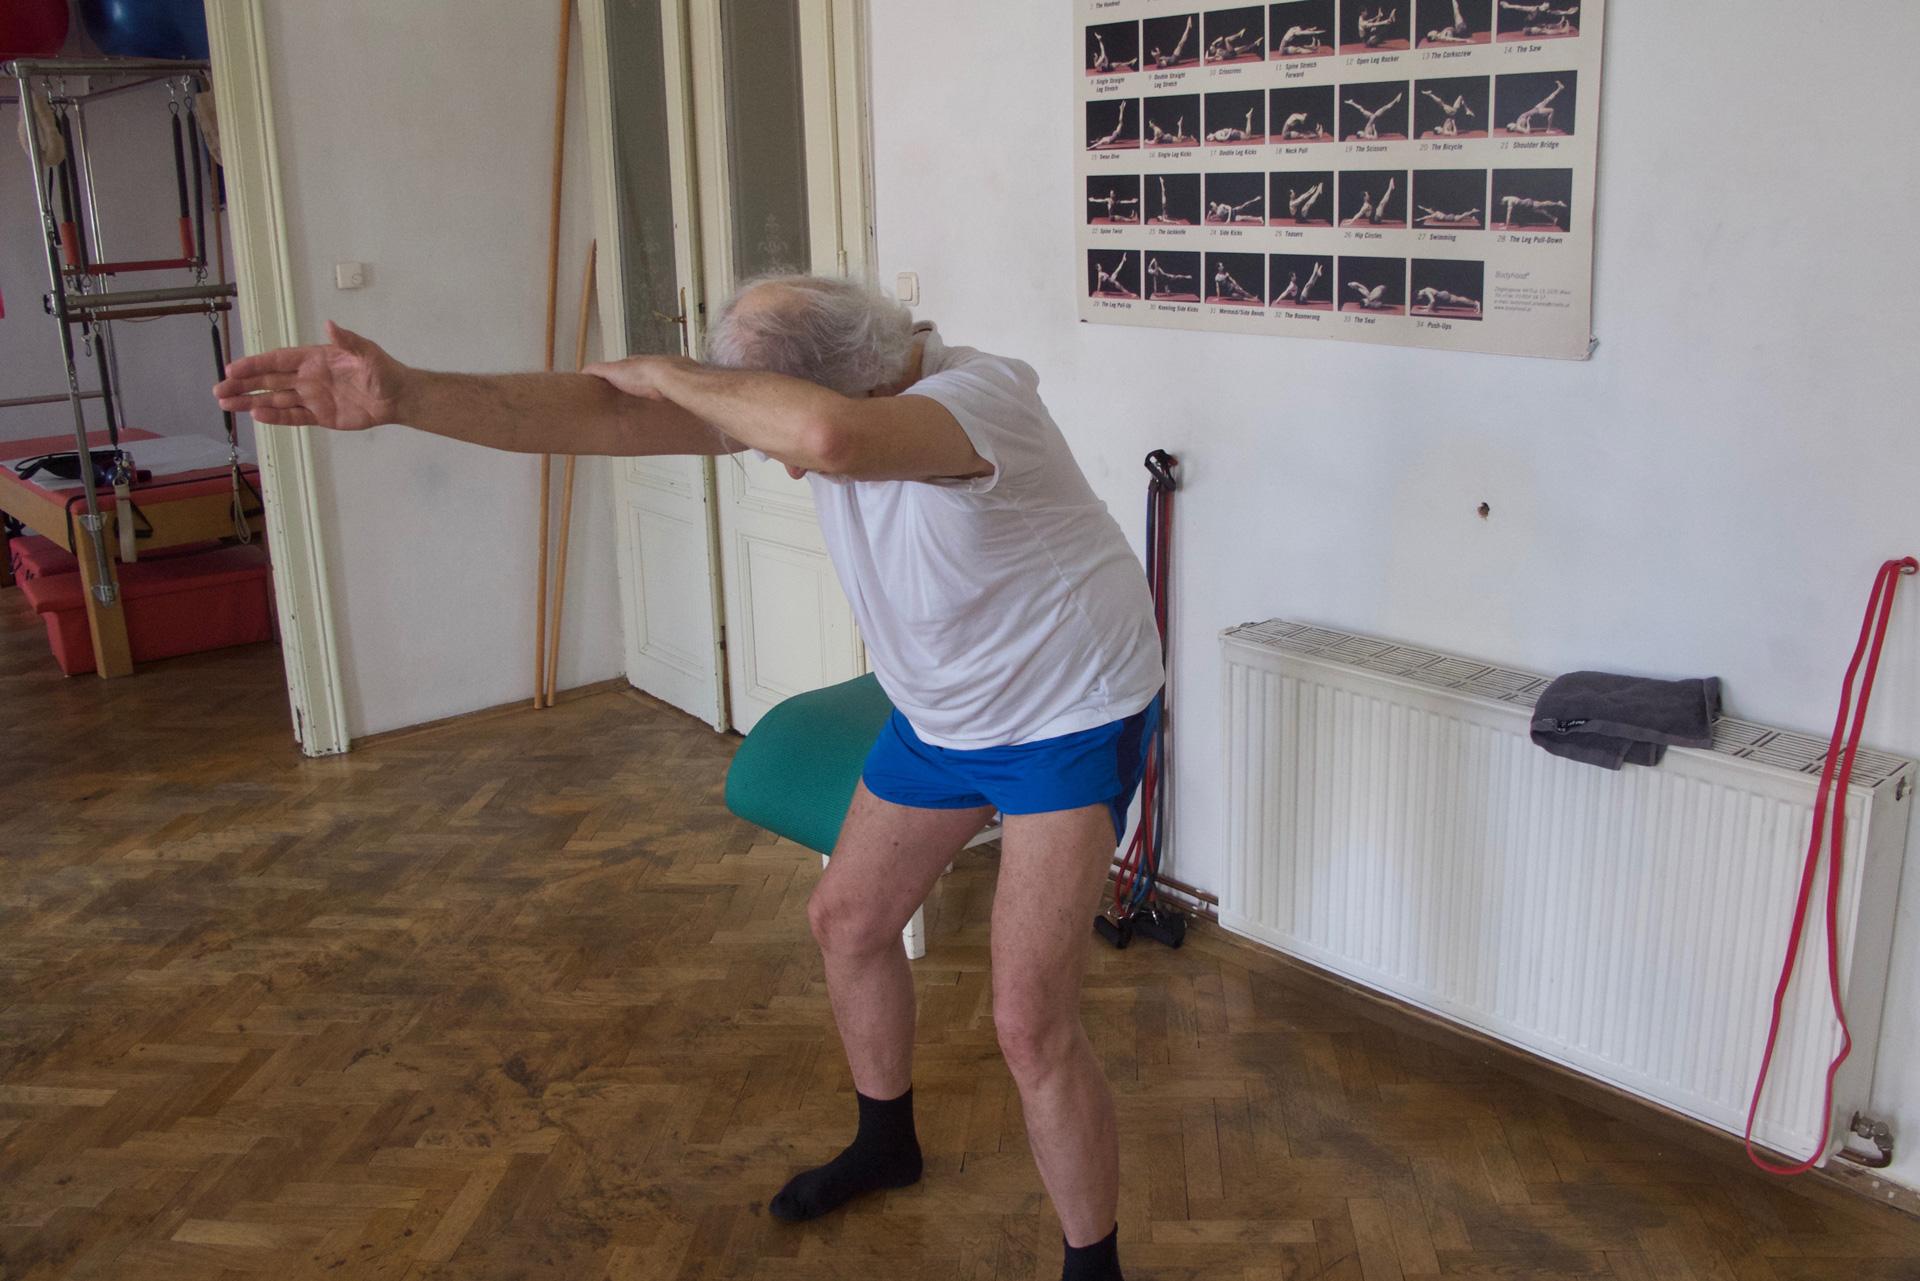 Brustwirbelsäule entspannen Lendenwirbelsäule entlasten Pilates Körperbewusstheitstraining therapeutische Übungen